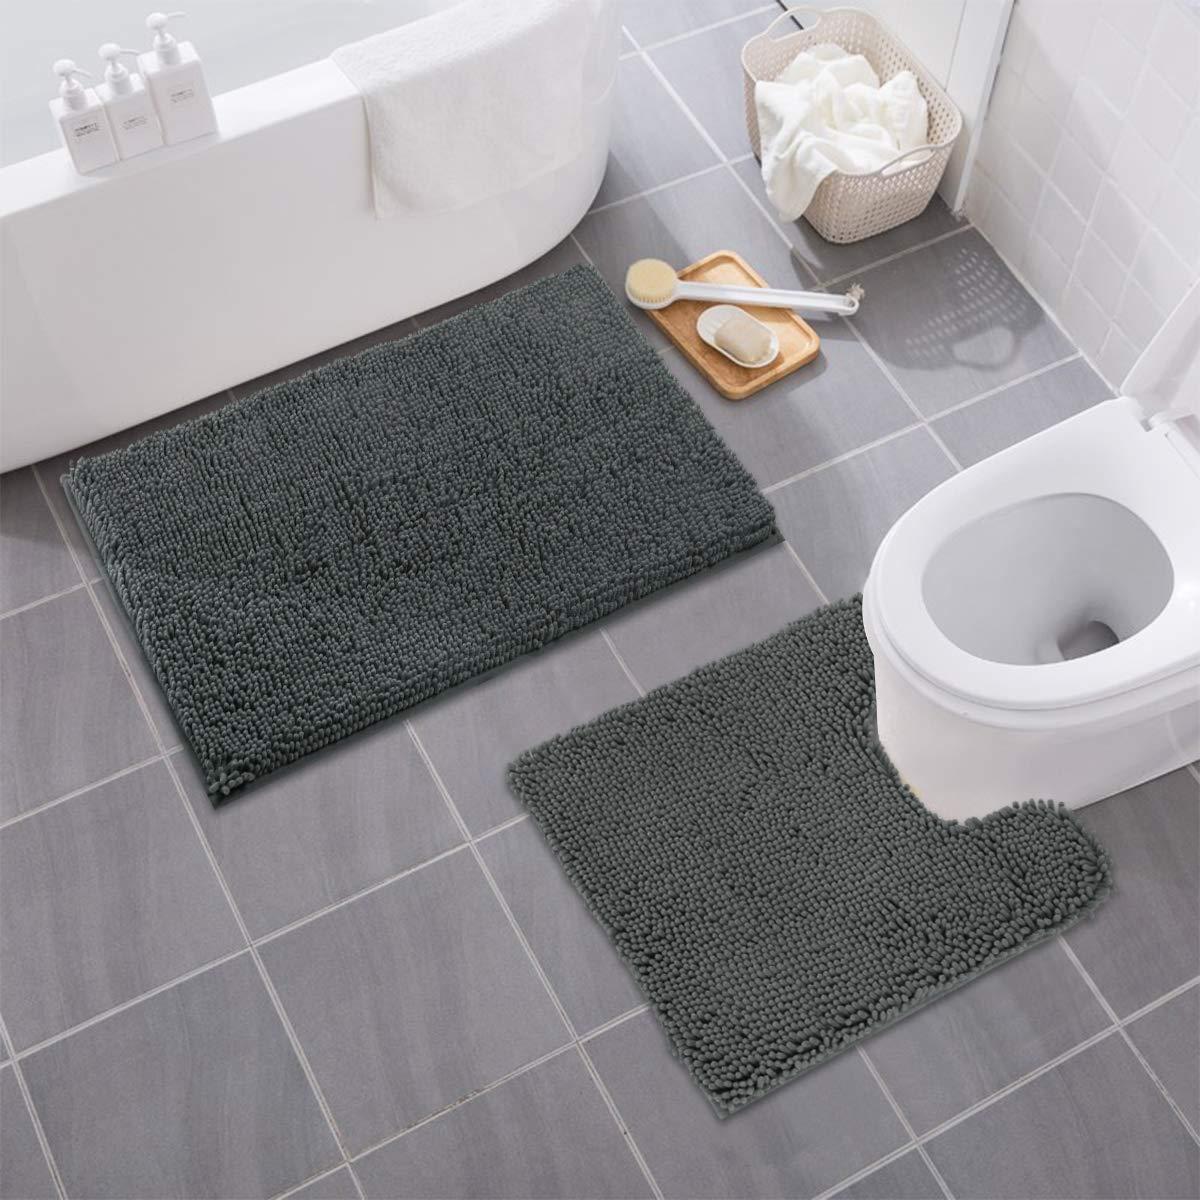 MAYSHINE Bathroom Rug Toilet Sets and Shaggy Non Slip Machine Washable Soft Microfiber Bath Contour Mat (Dark Gray, 32x20 / 20x20 Inches U-Shaped)